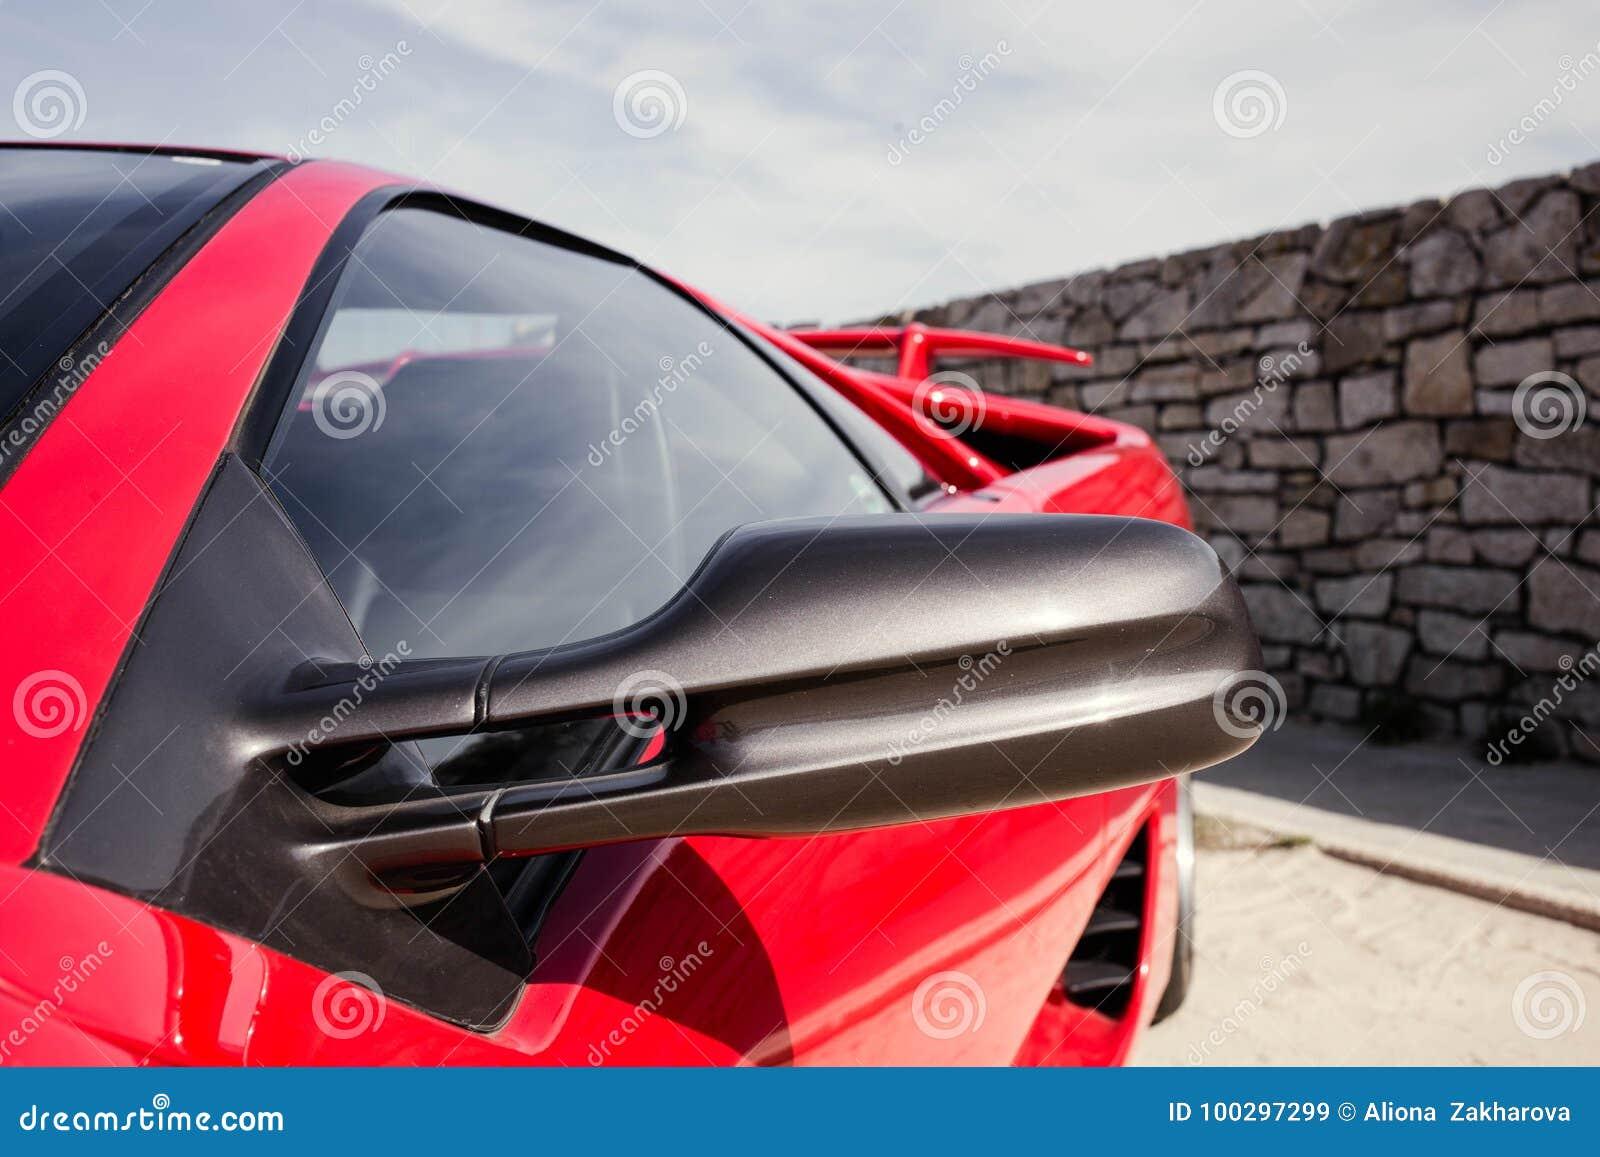 Lamborghini Stock Image Image Of Auto Drive Wheel 100297299